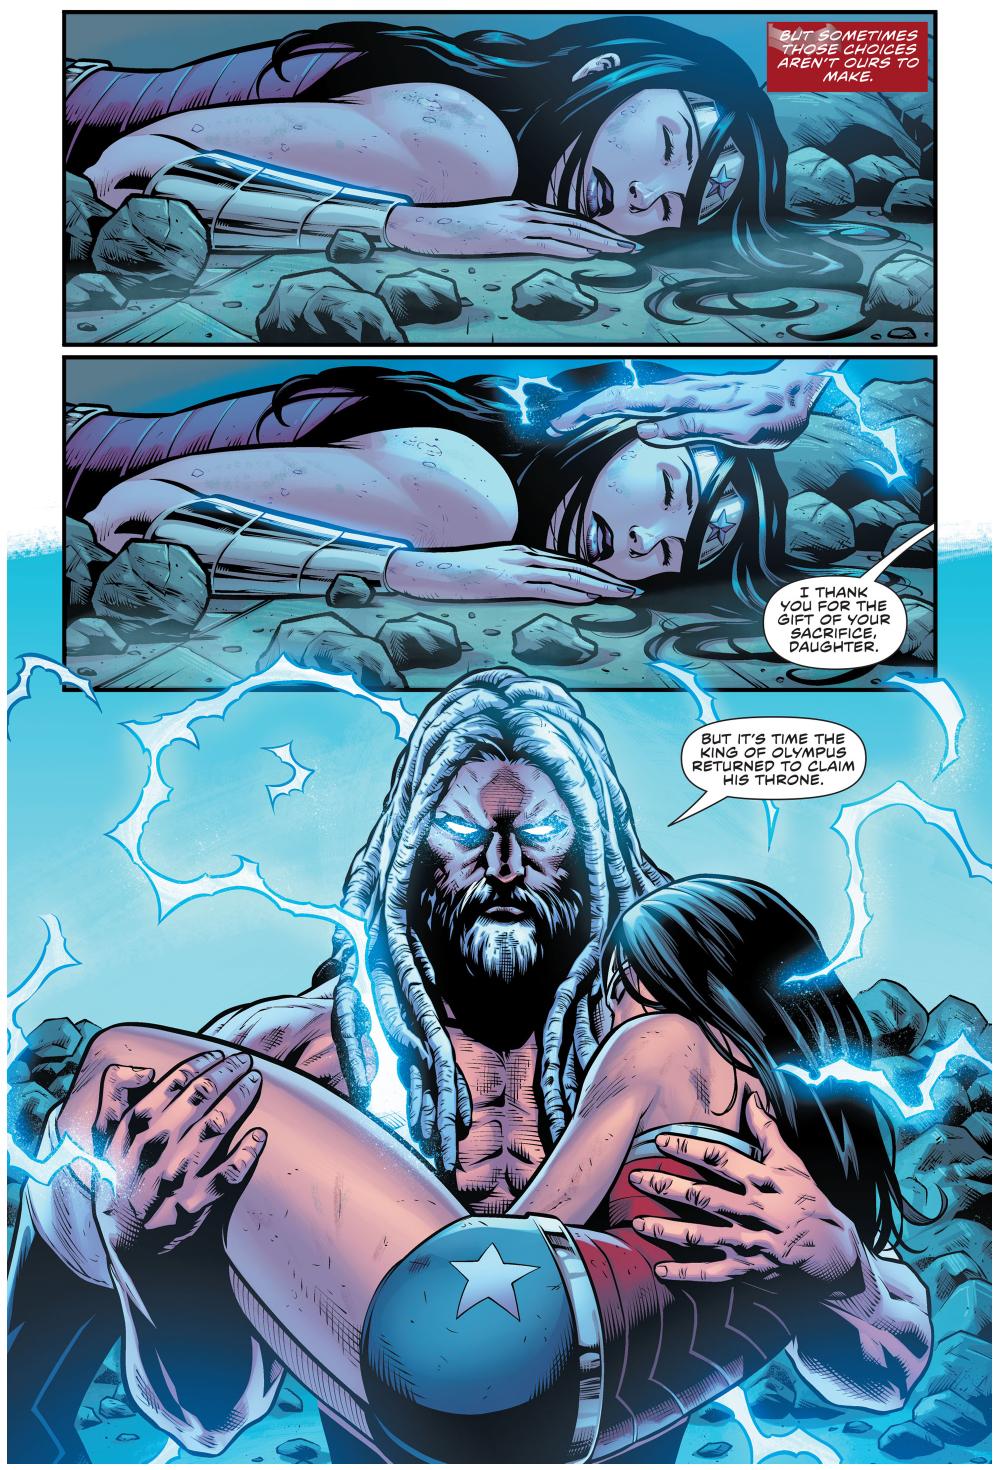 Wonder Woman Saves Zeus's Life